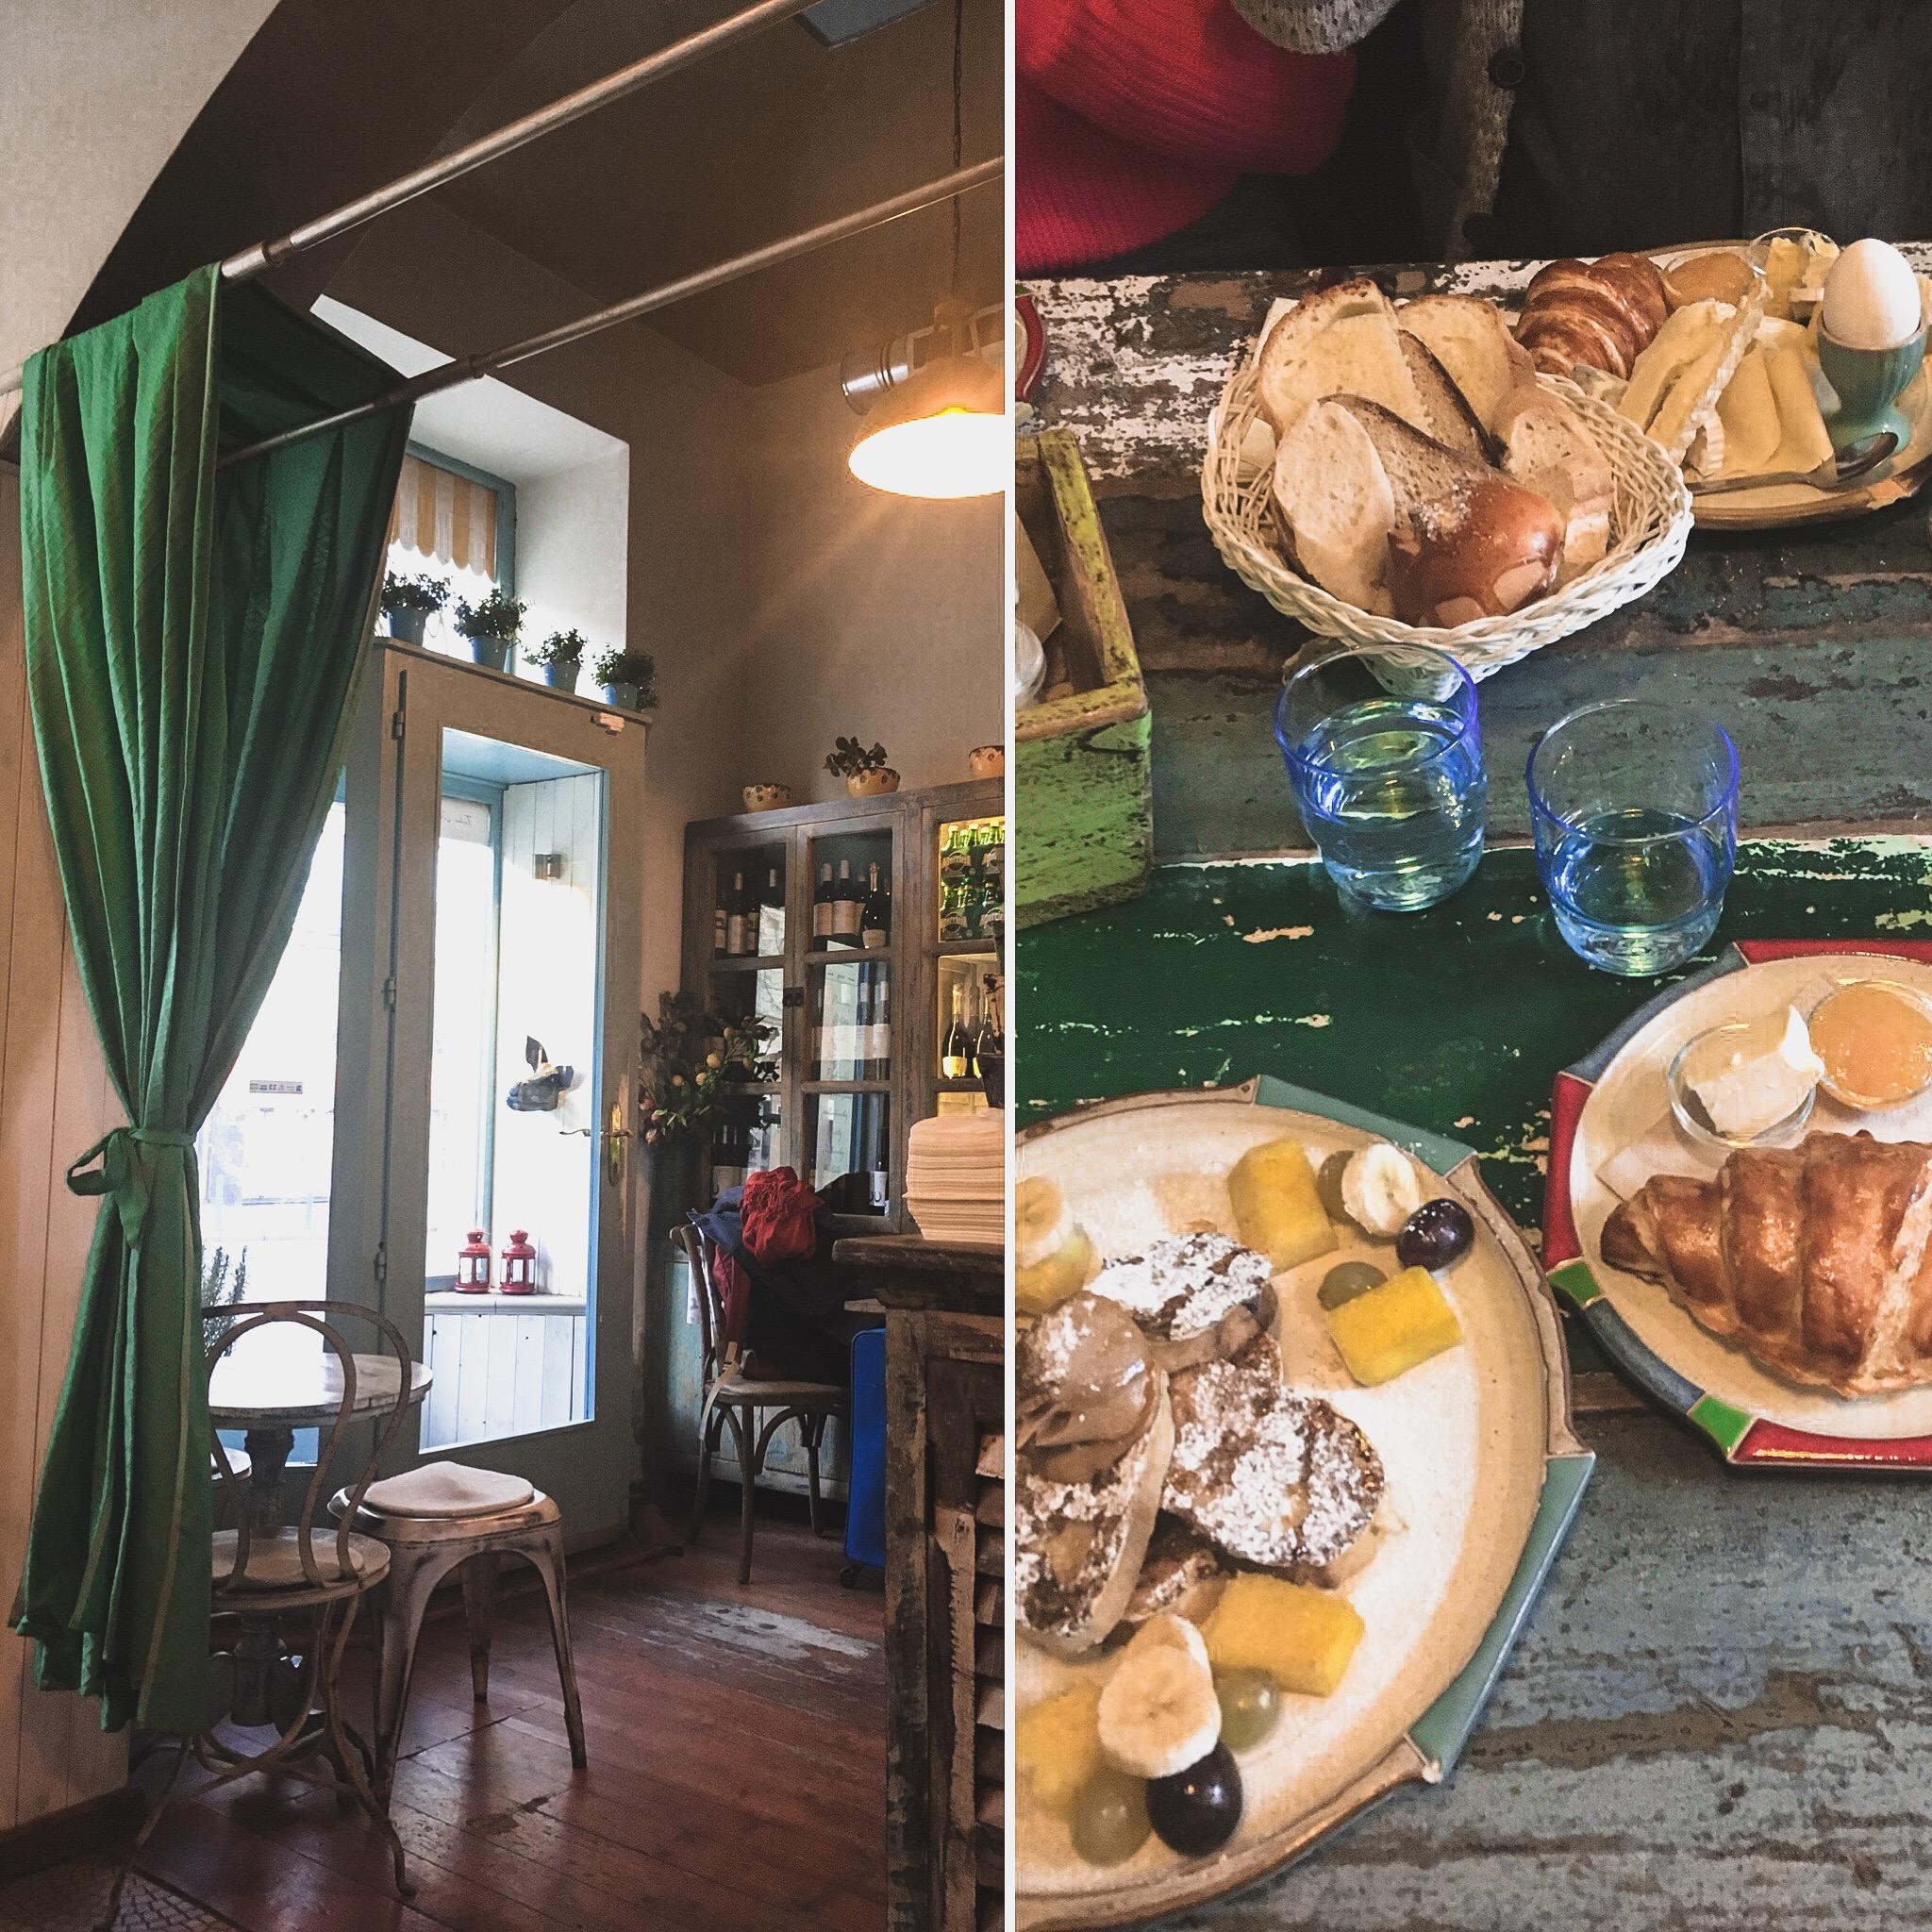 Marthys kitchen Praha